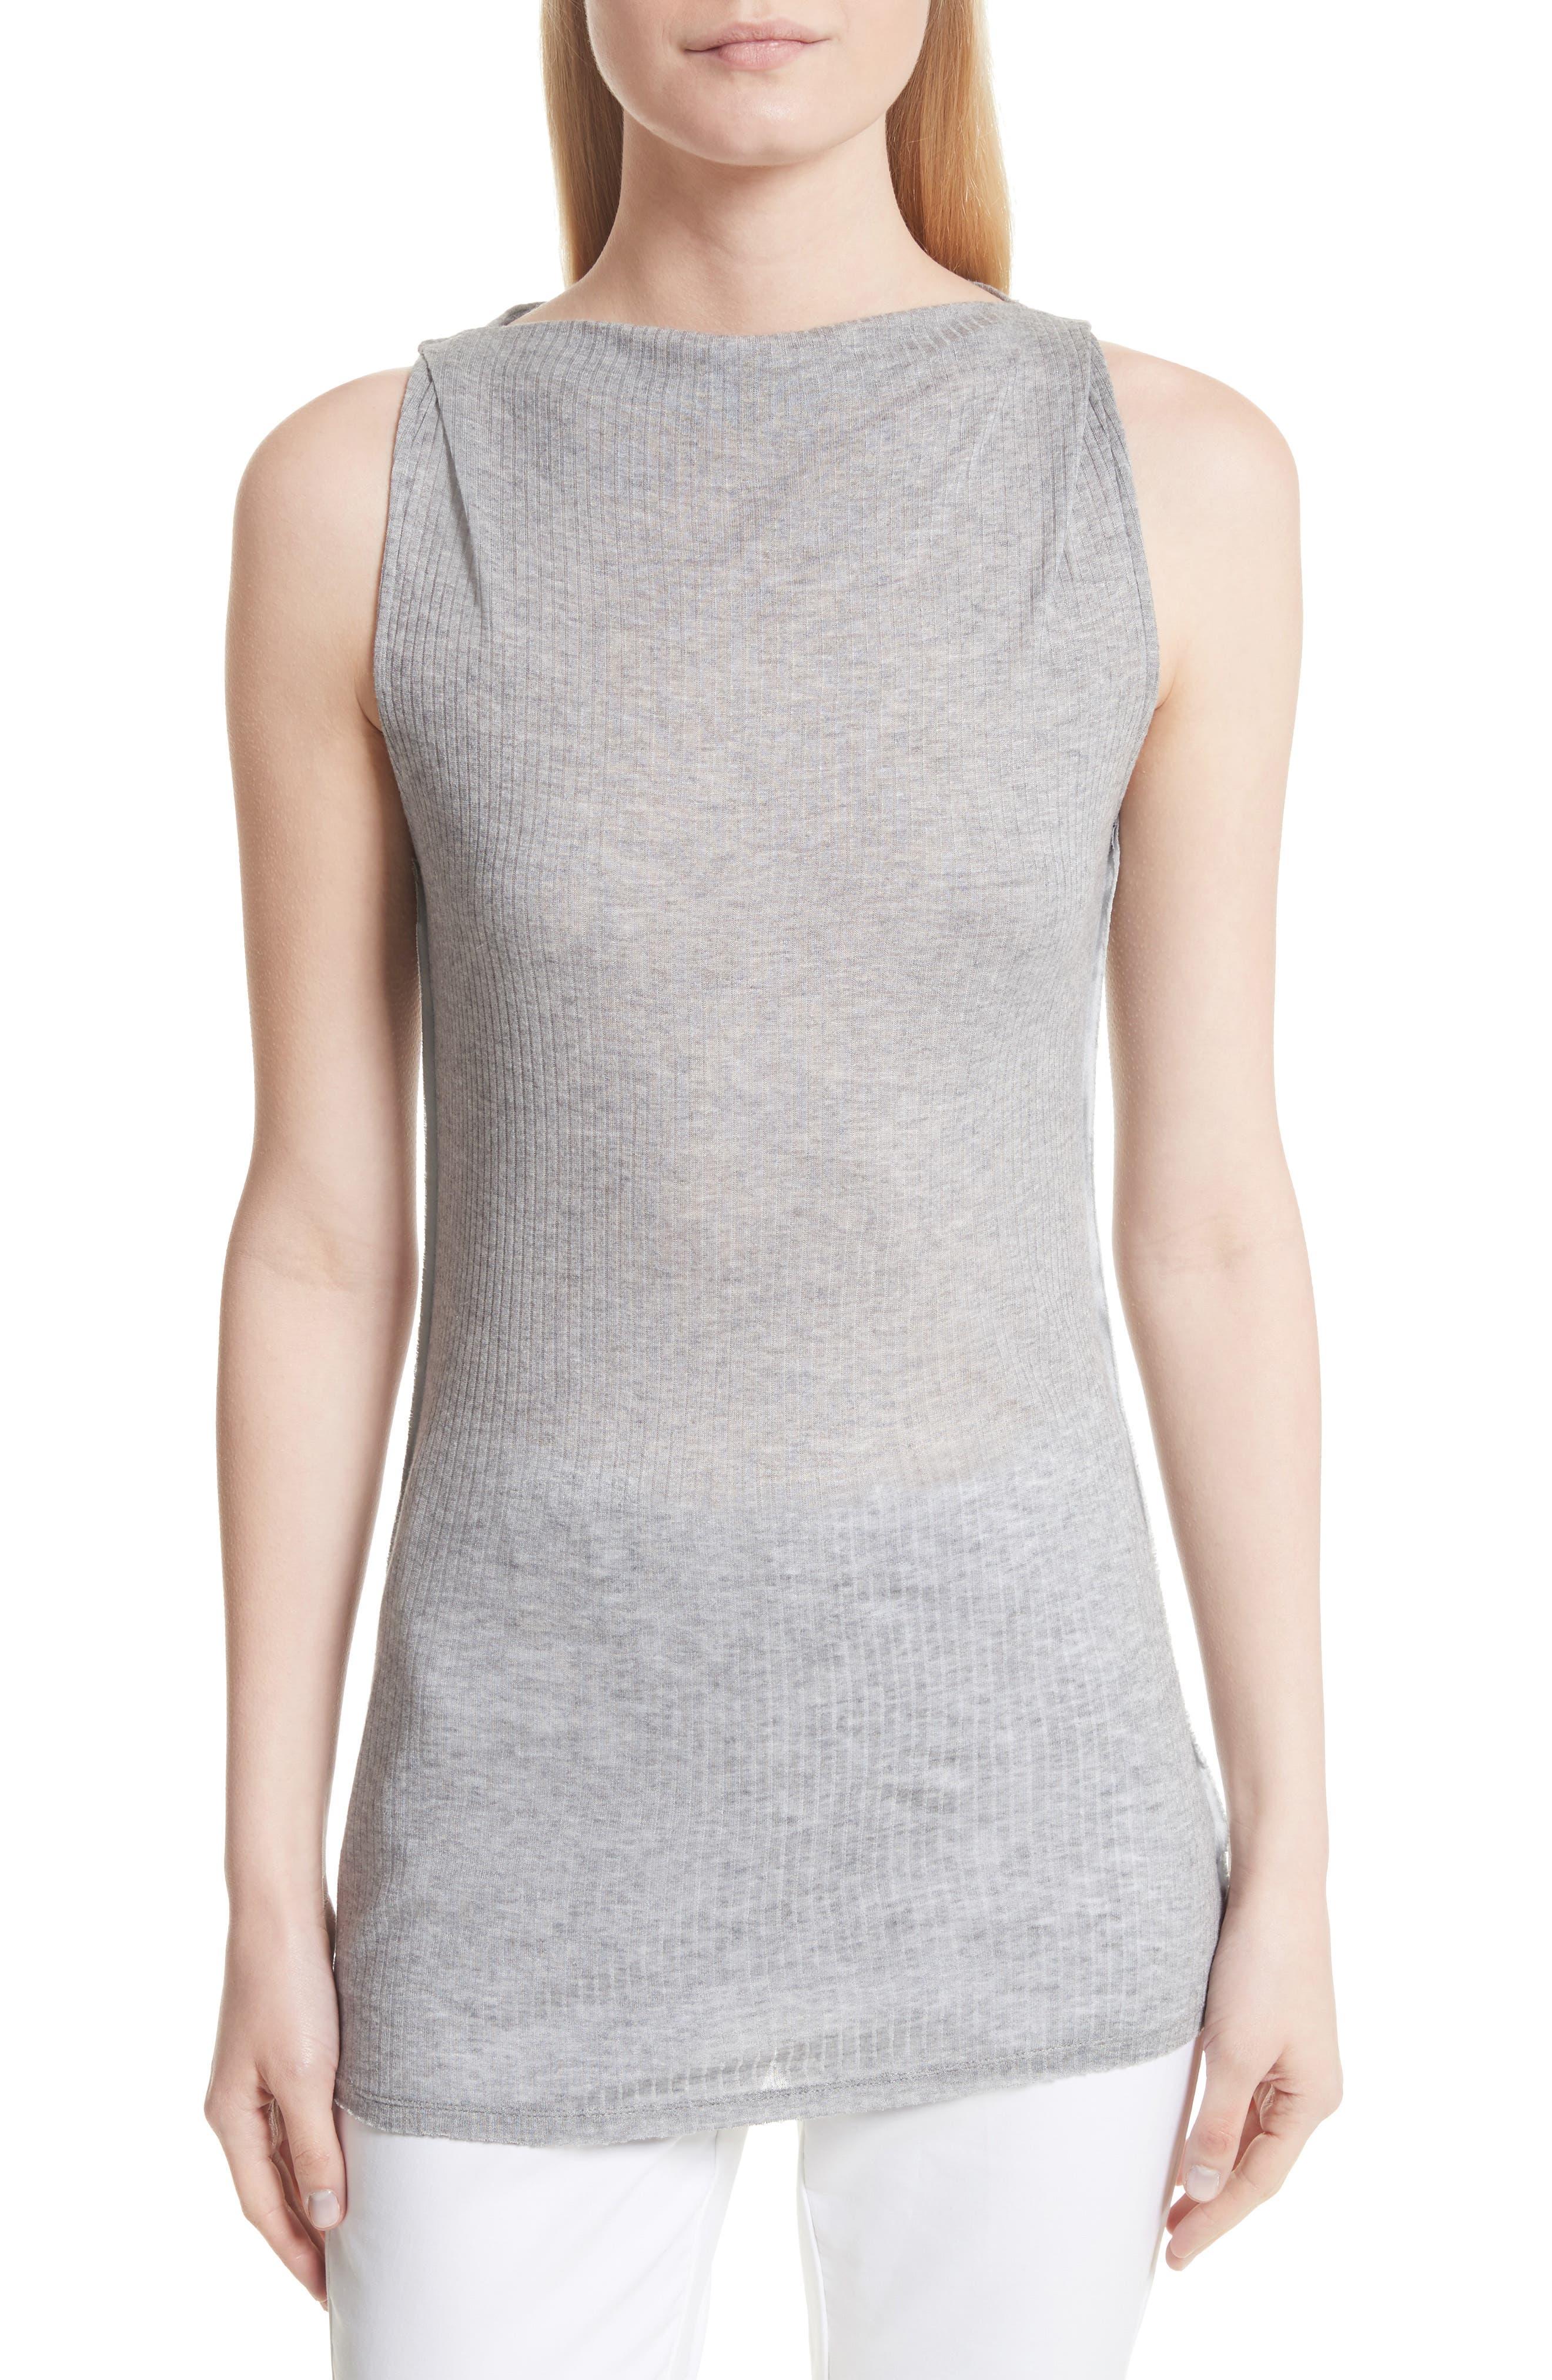 Alternate Image 1 Selected - rag & bone Madison Sleeveless Top